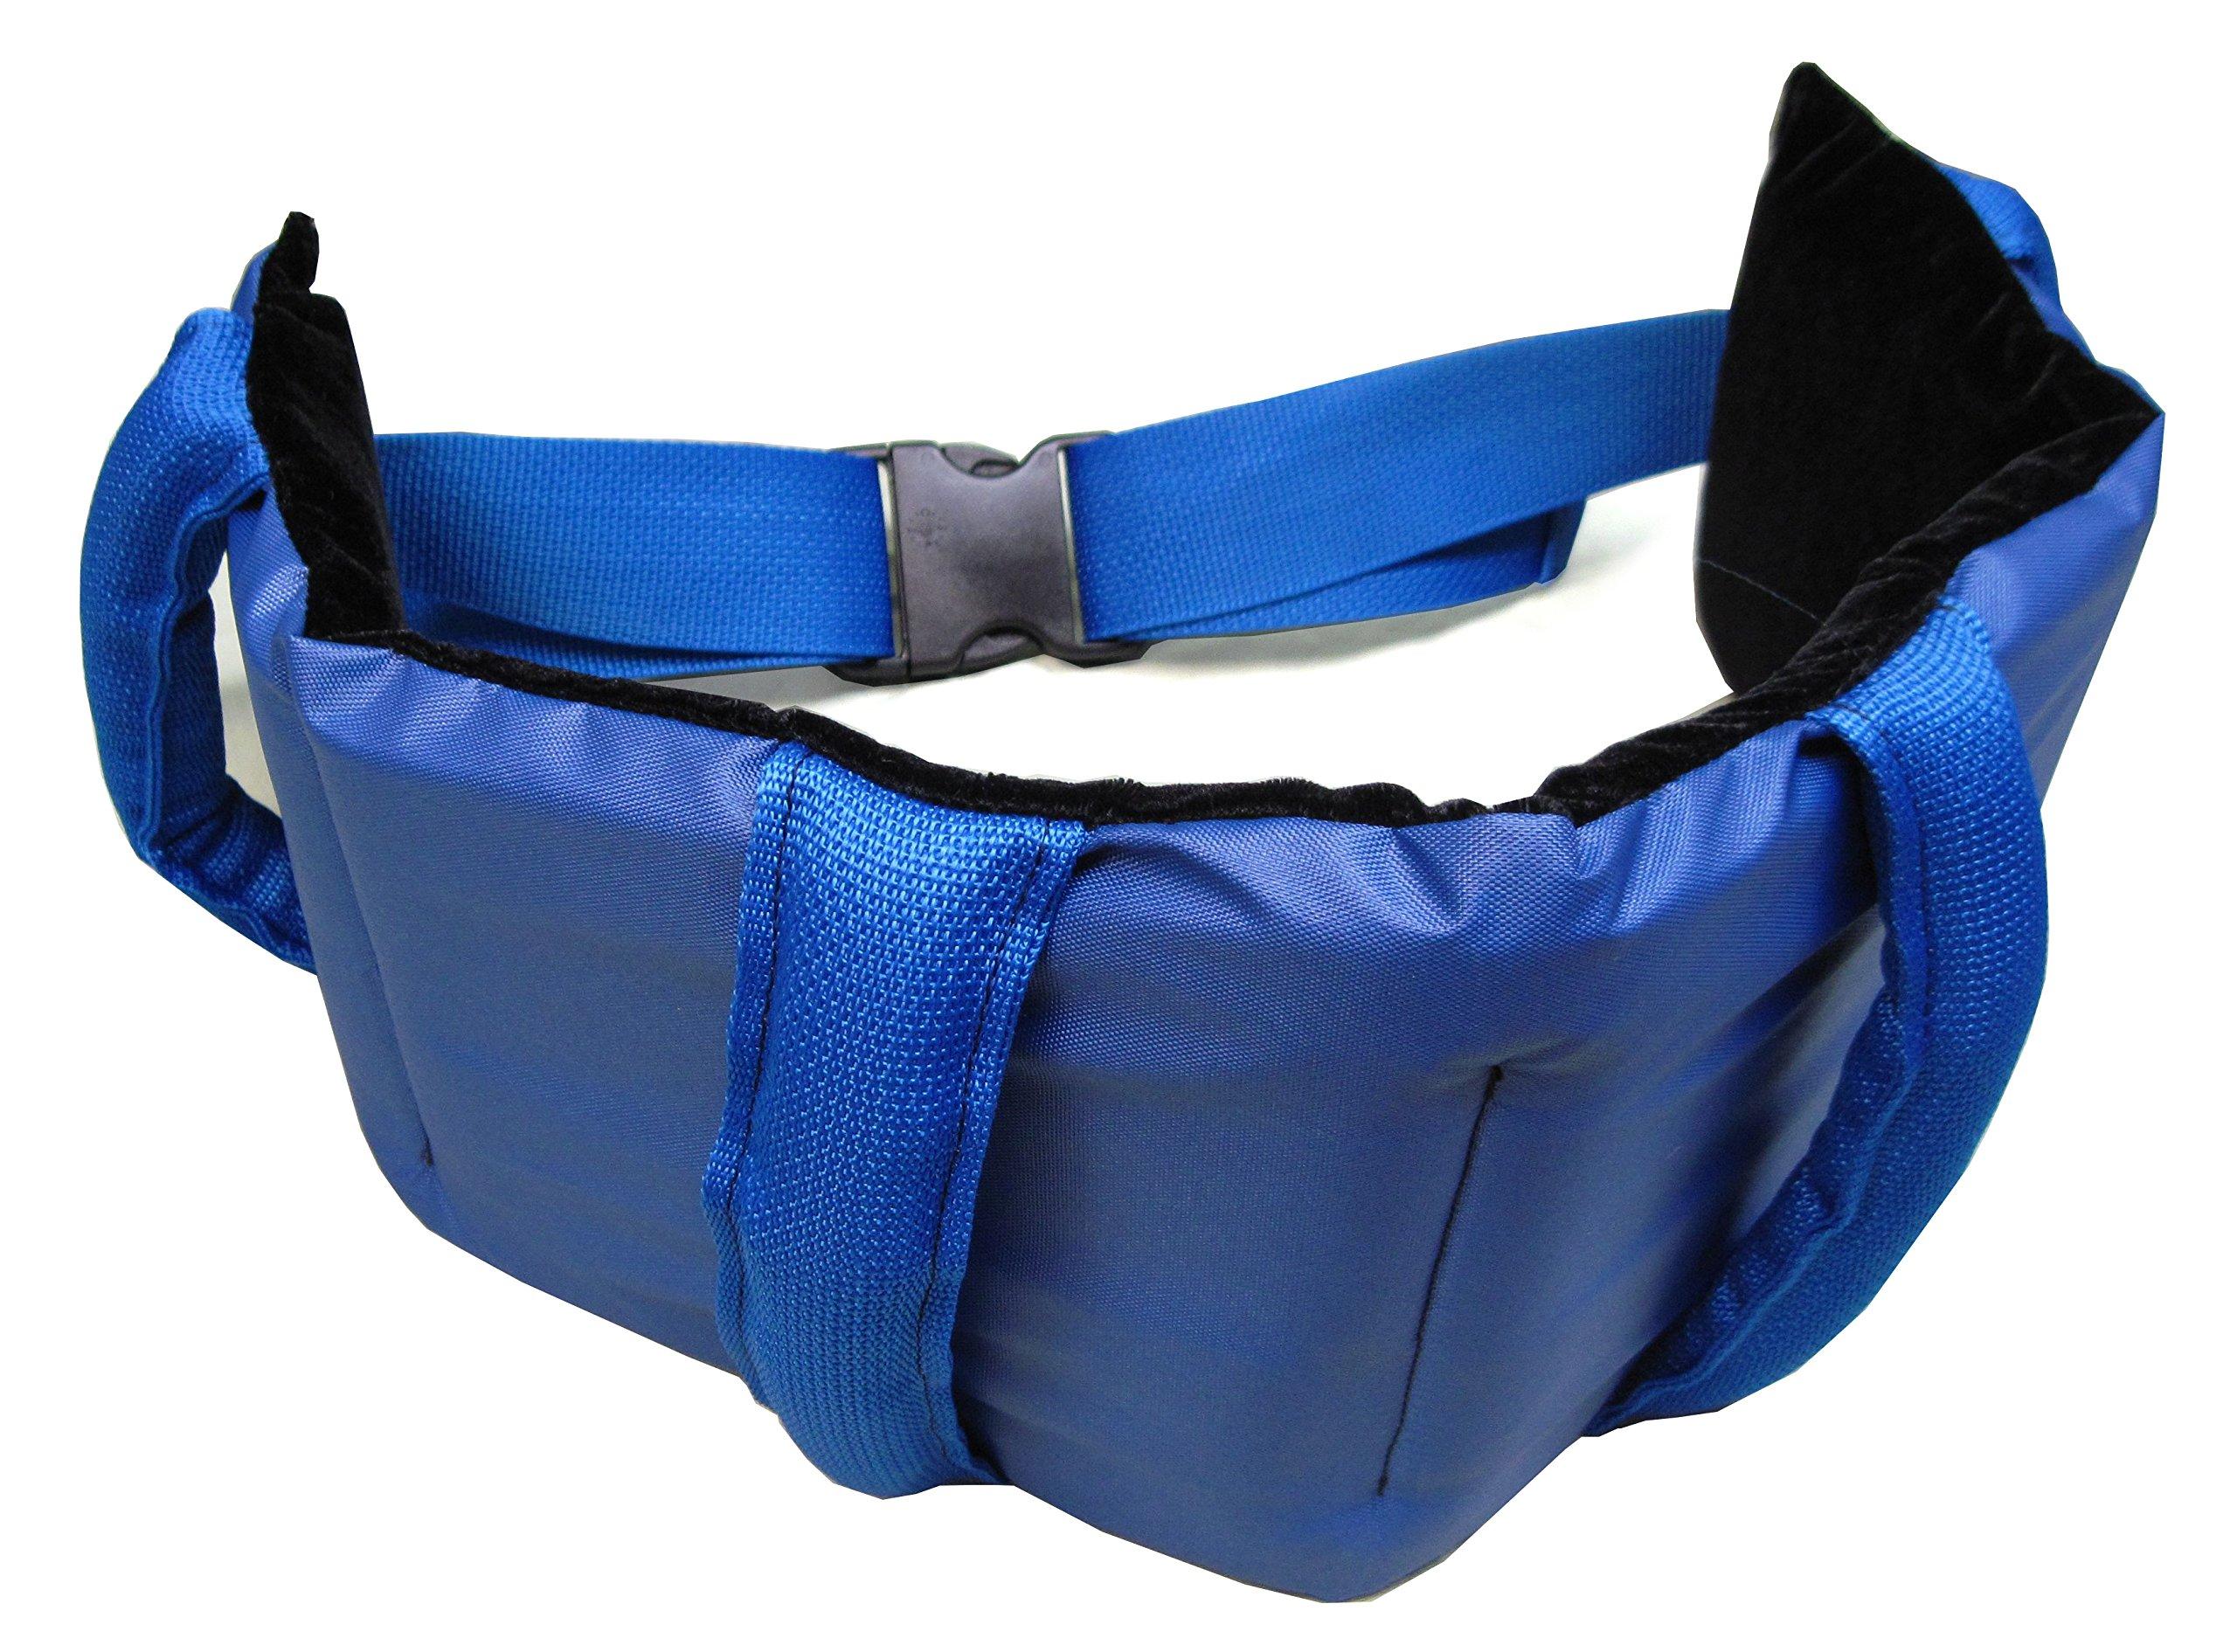 JDM Medical Elite Gait Belt with Handles for Transfer and Mobility Assistance by JDM Medical